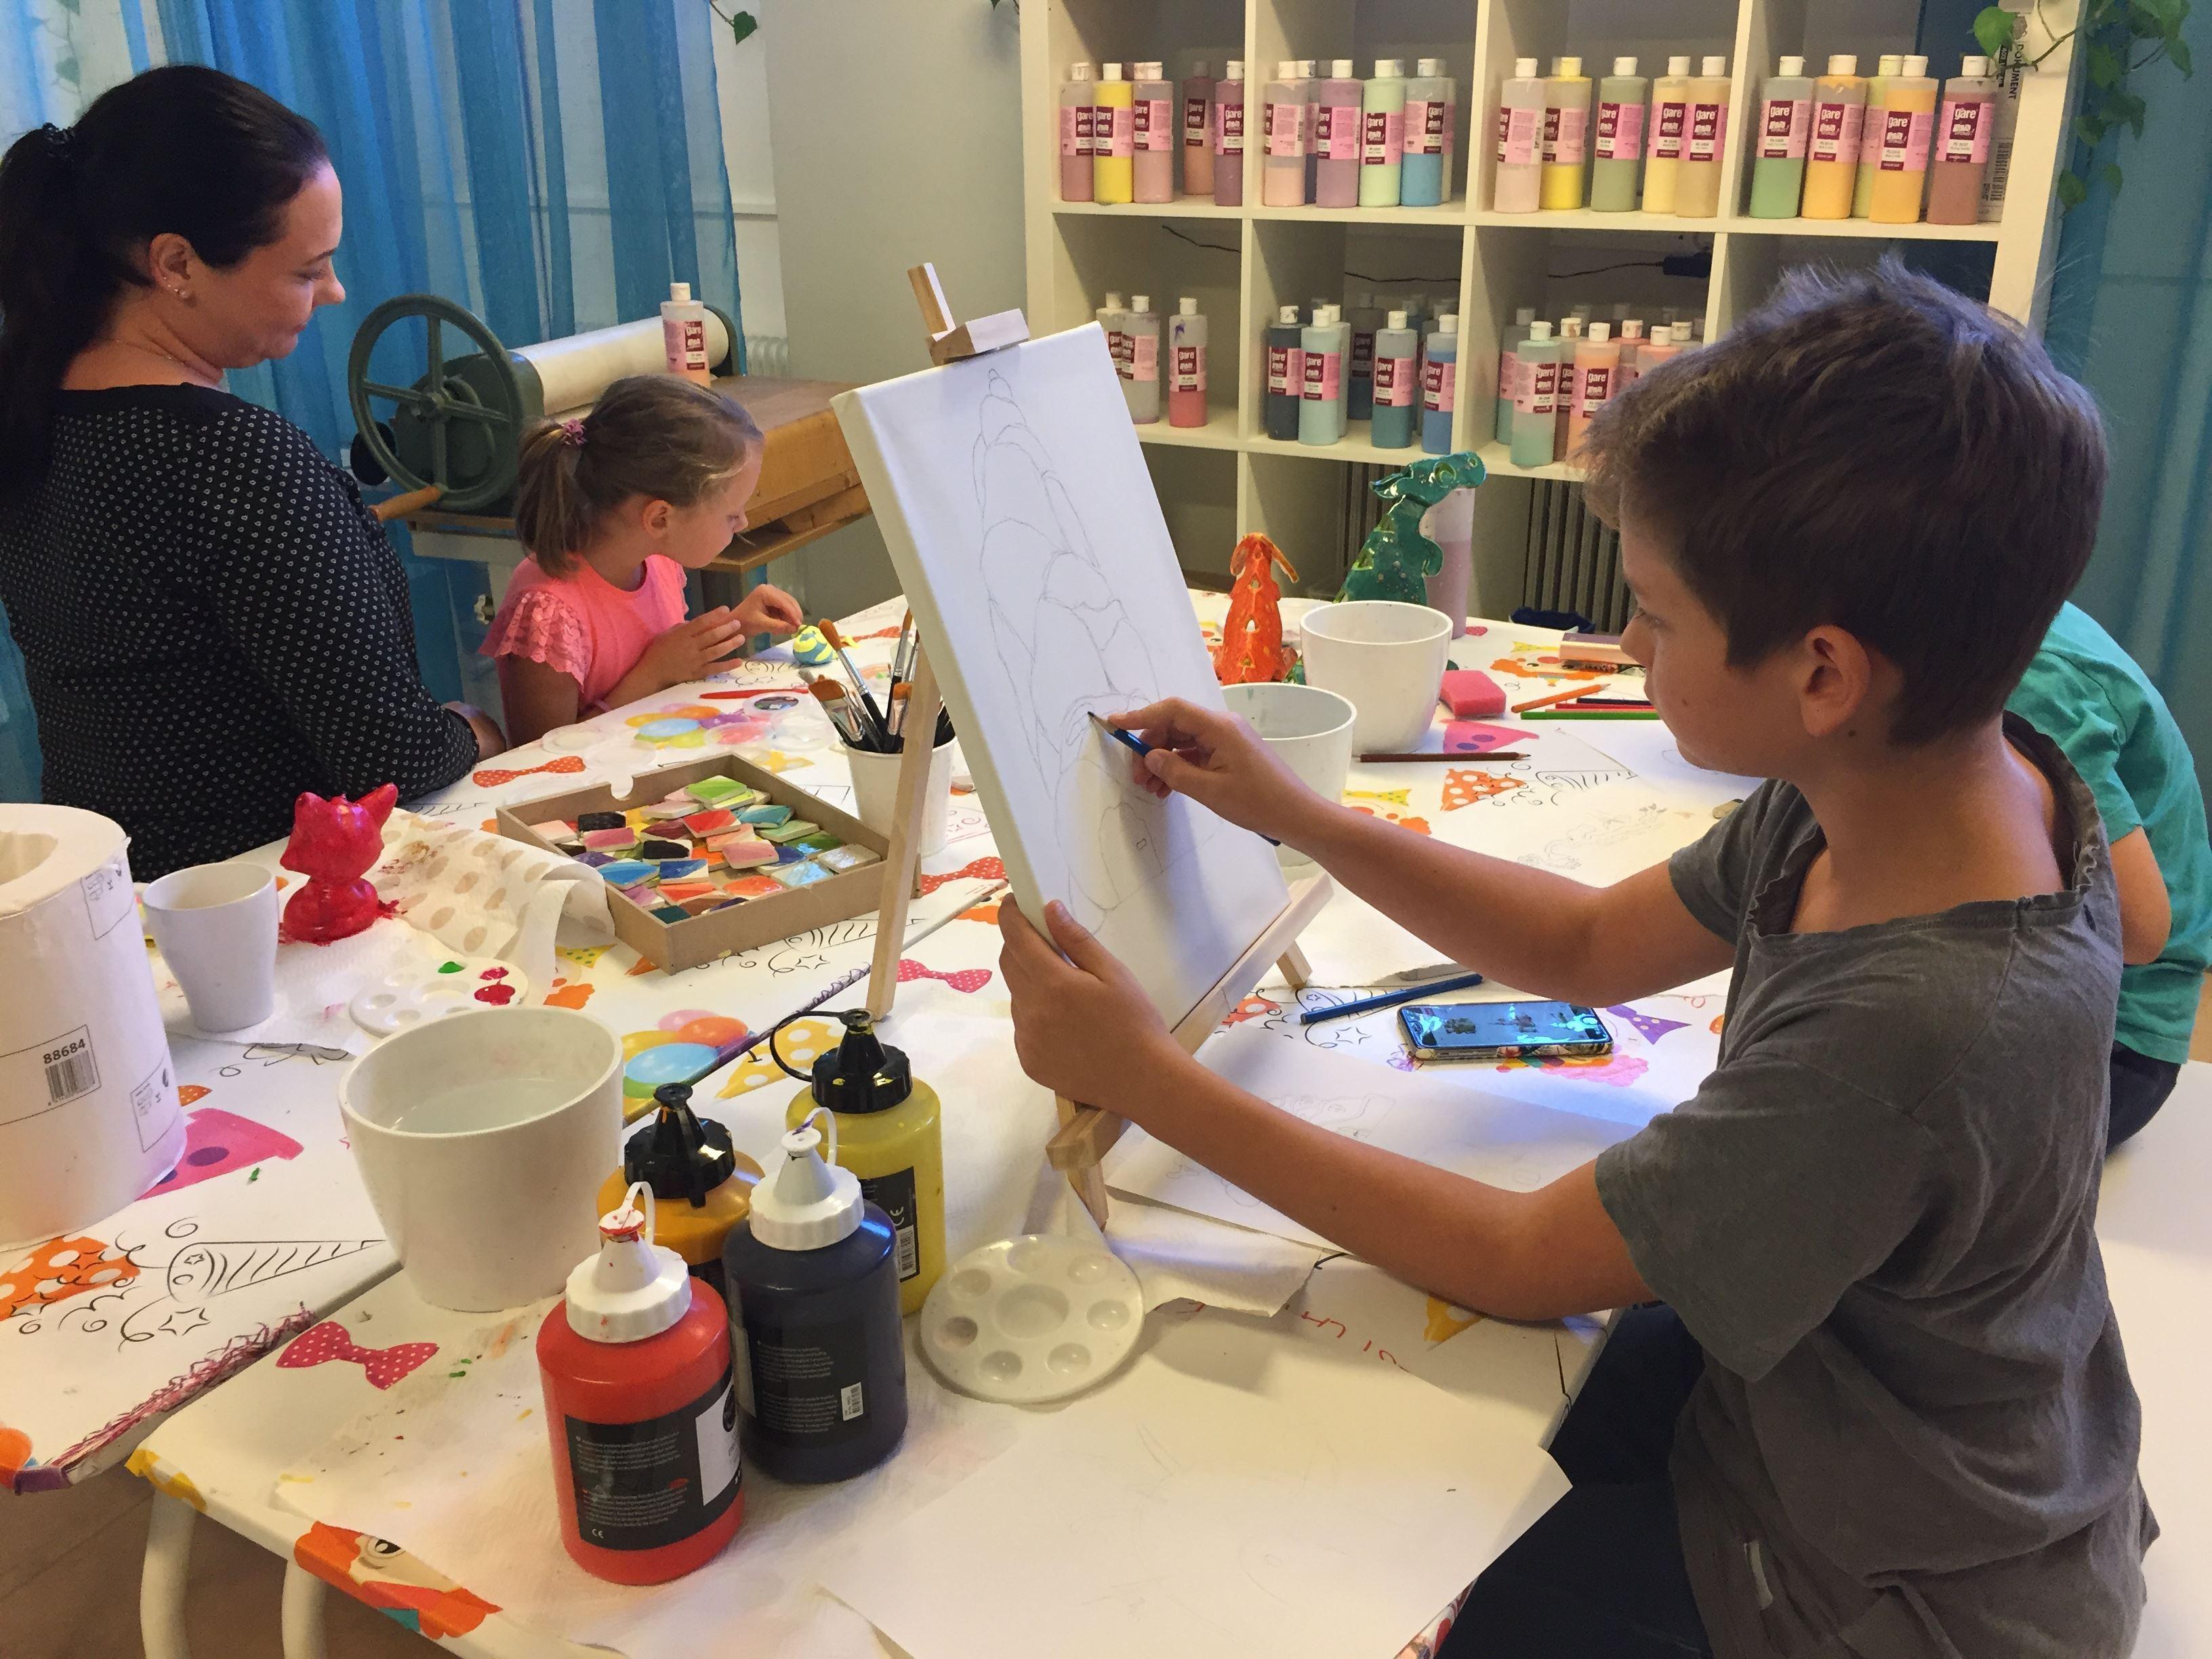 Kreativa - plaster and ceramic painting